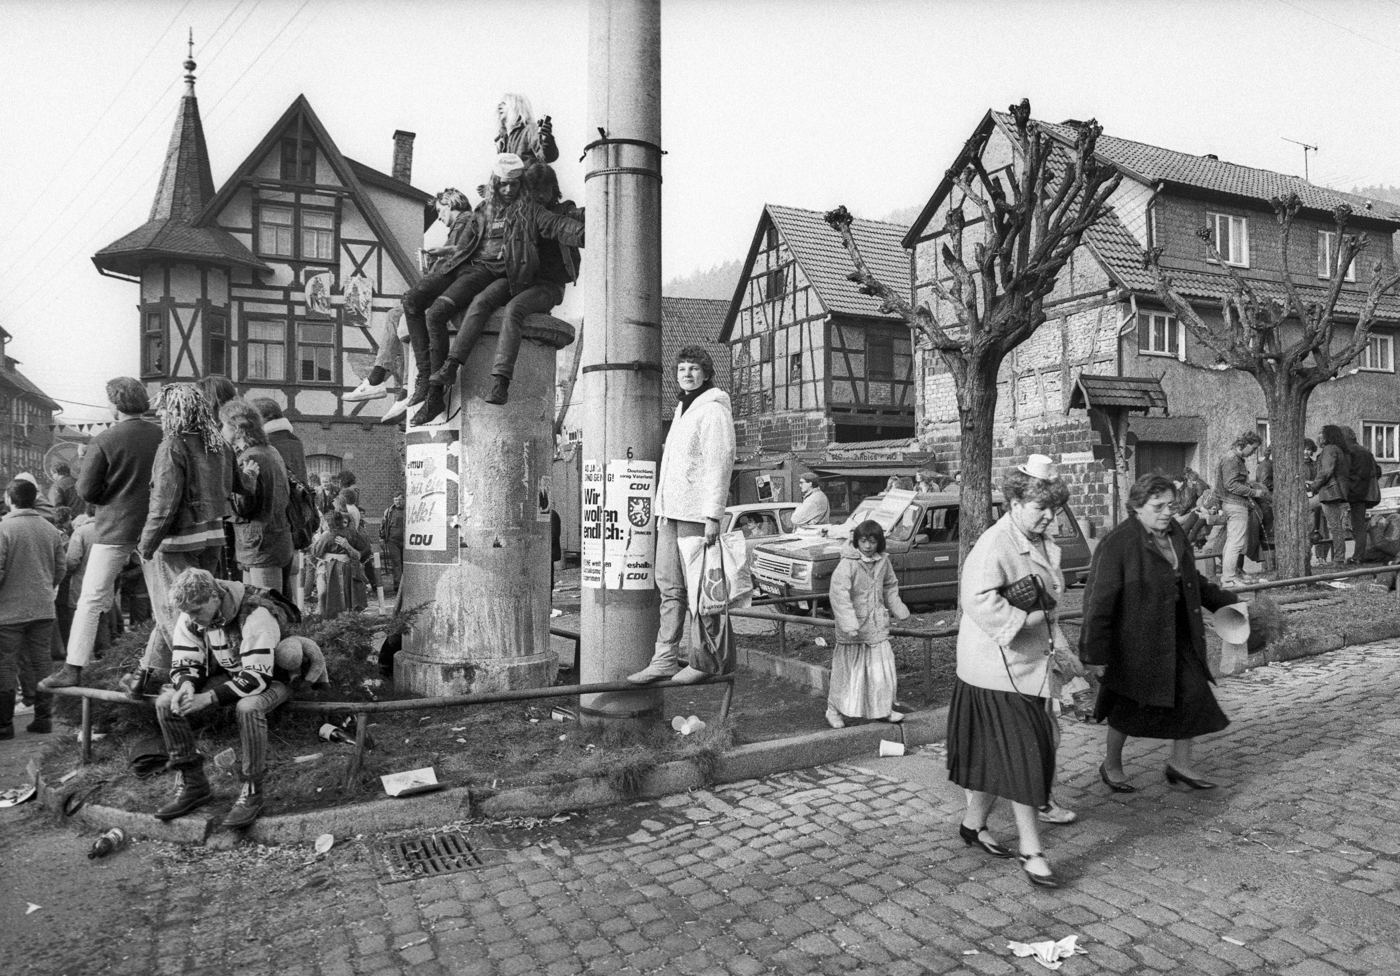 Karnevalisten in Wasungen, Thüringen